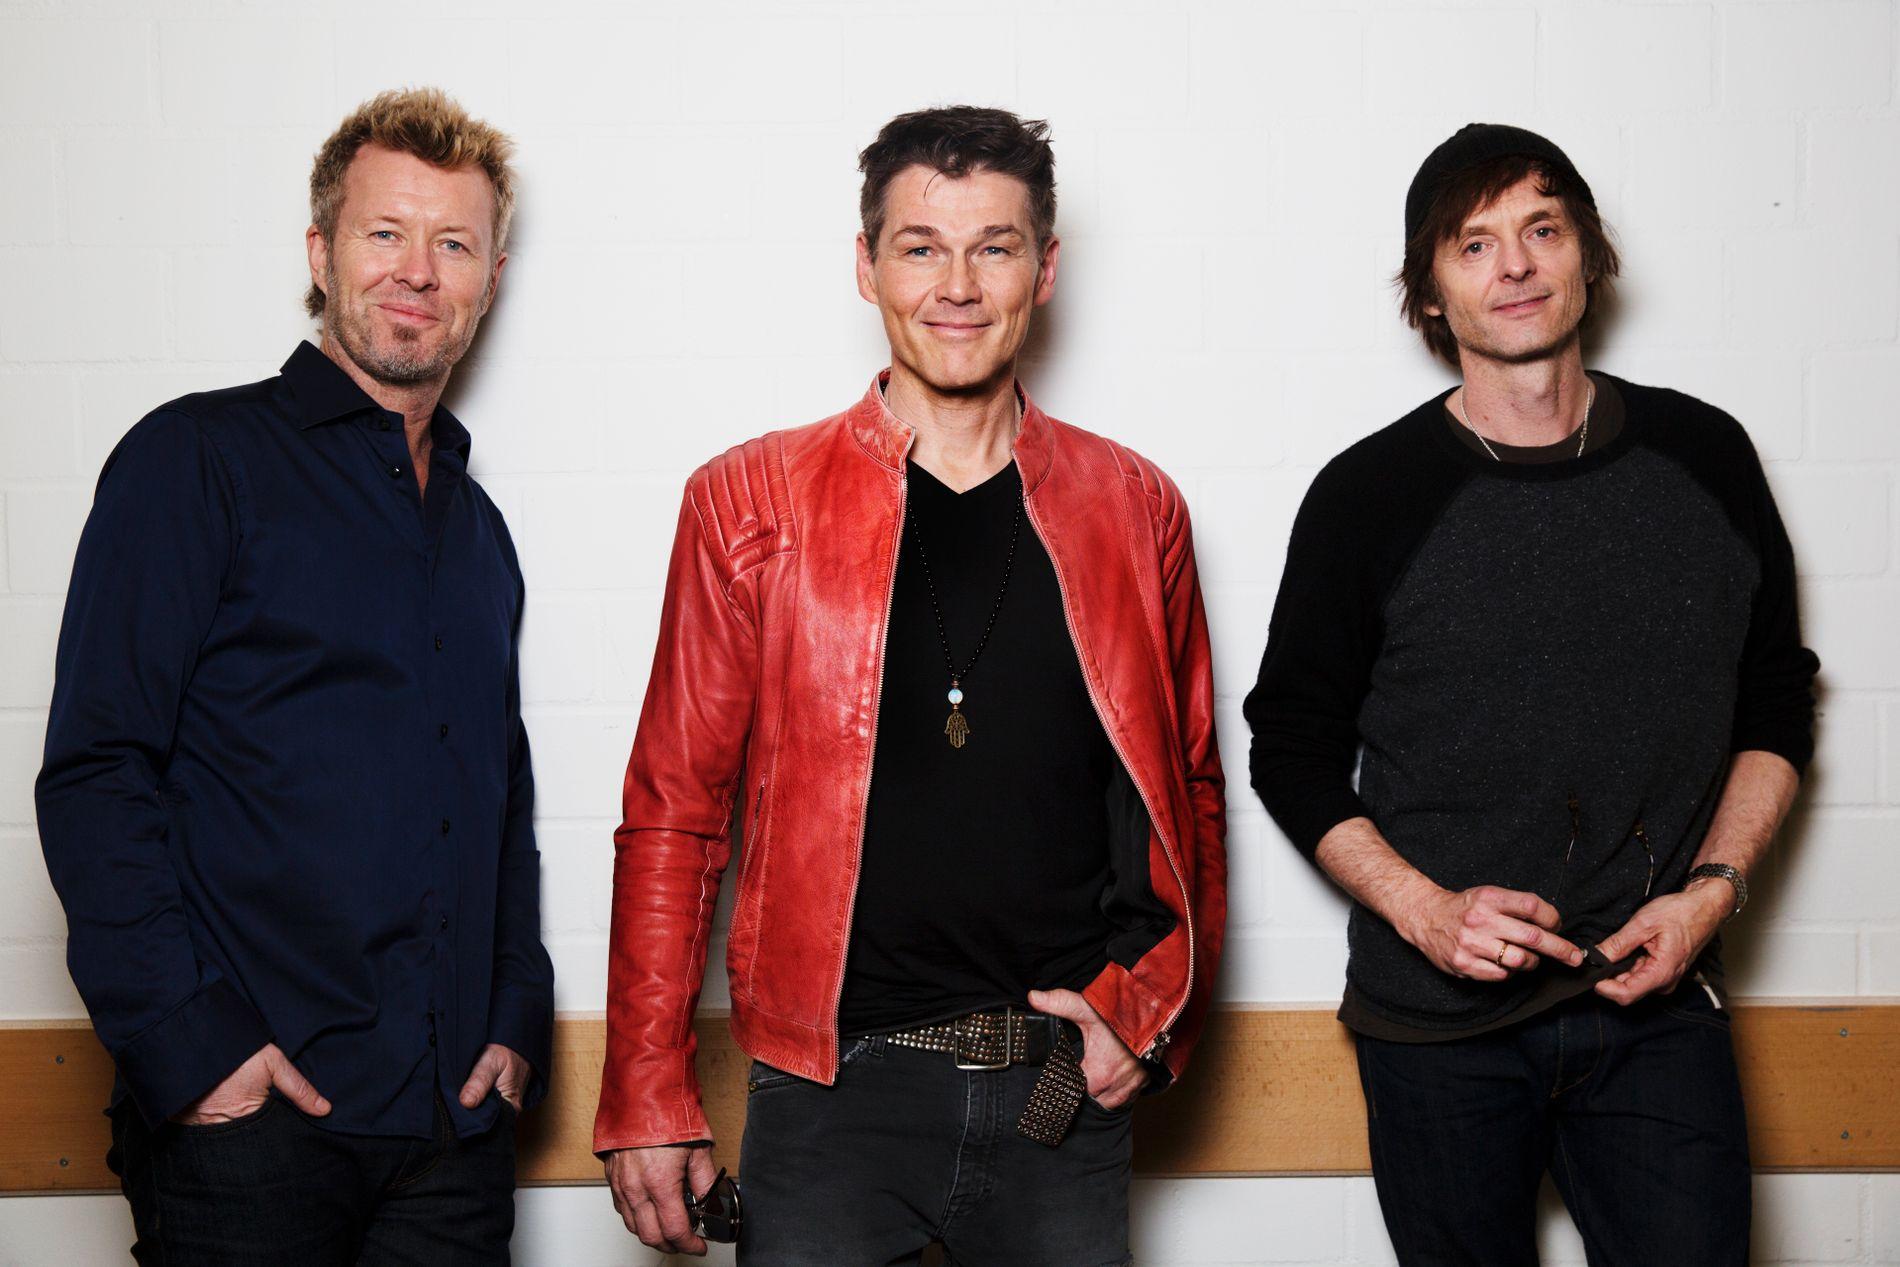 TURNÉKLARE: A-ha starter «Hunting high and low»turneen sin i Dublin 29. oktober. I februar gjester de Dubai.